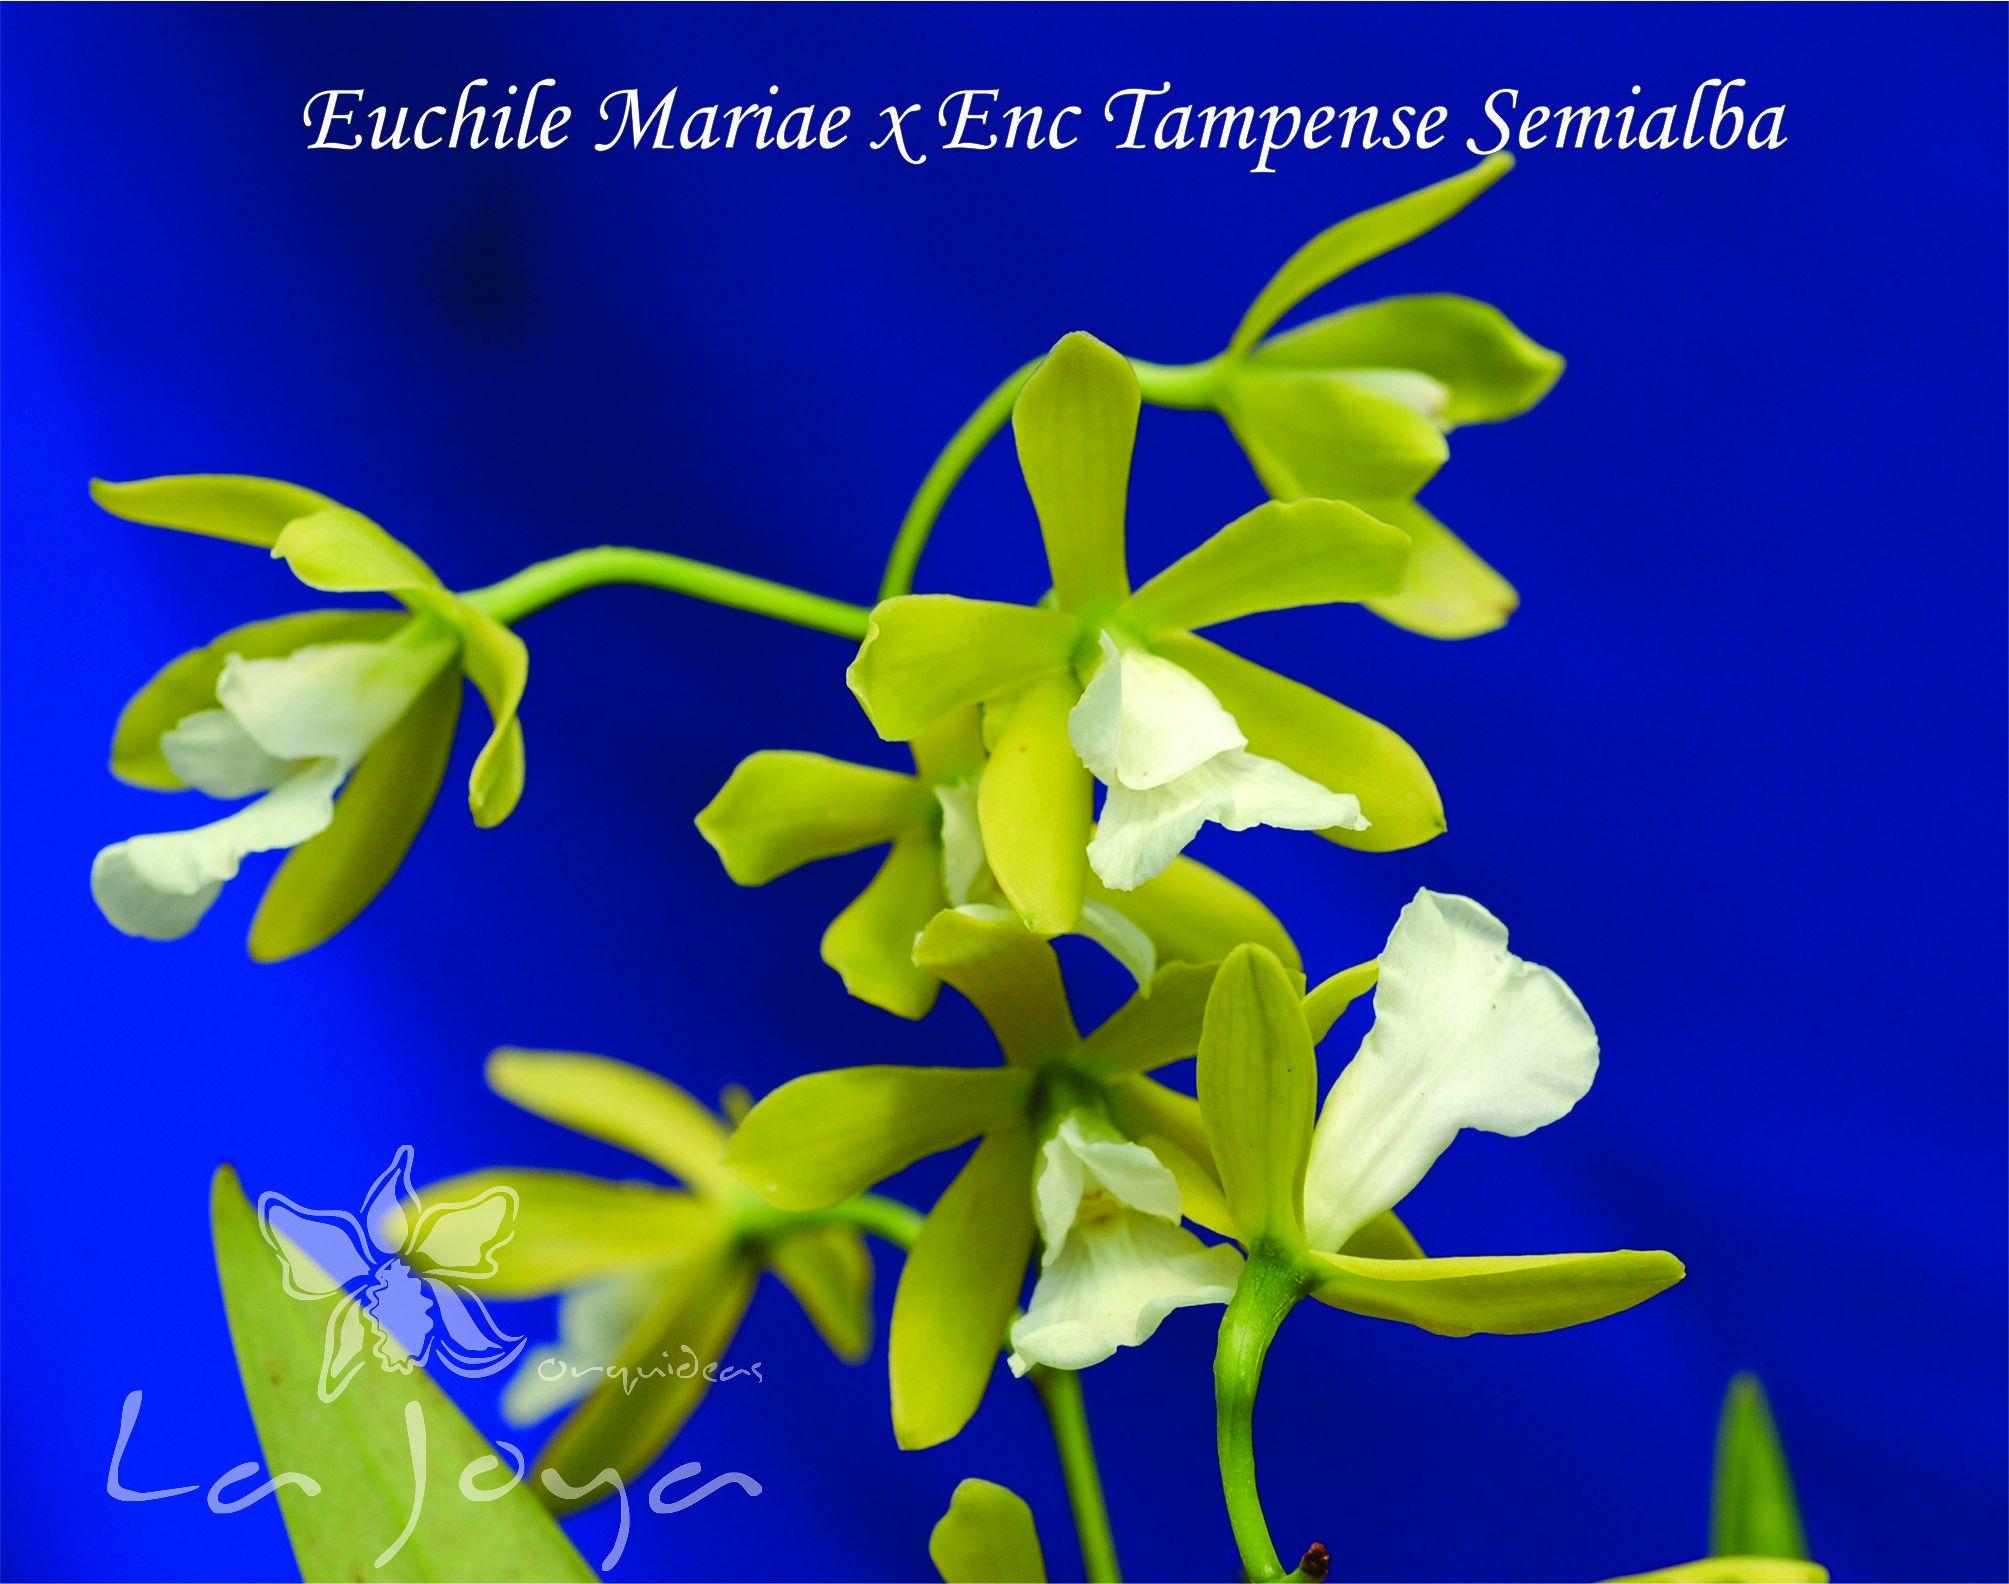 Encyclia Mariae x Enc. Tampense Semialba